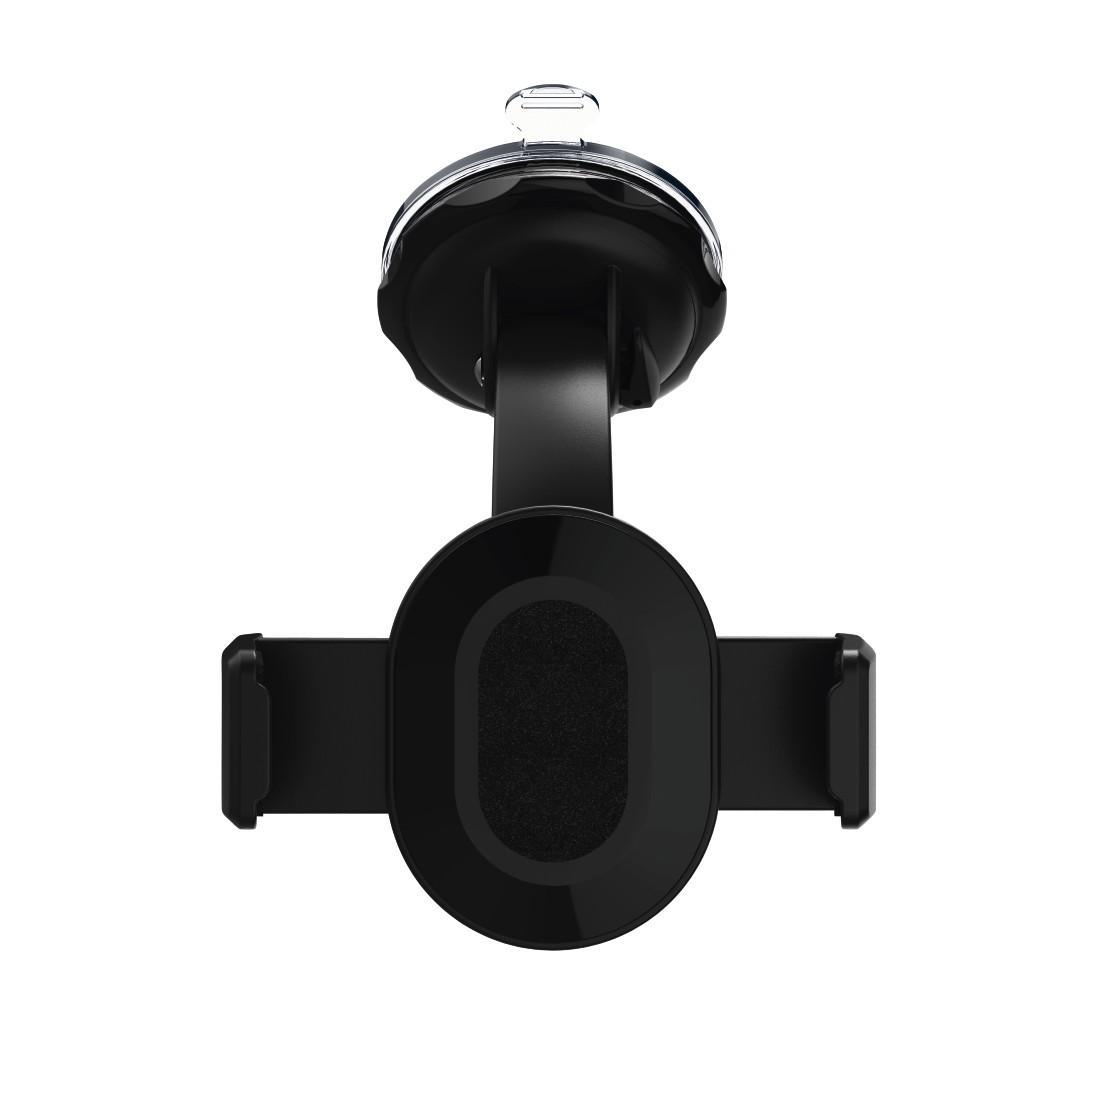 Универсална поставка/комплект/ за навигации/телефон/таблет за стъкло и кола HAMA 173896, размер 5.5 - 8.5 см, Черен